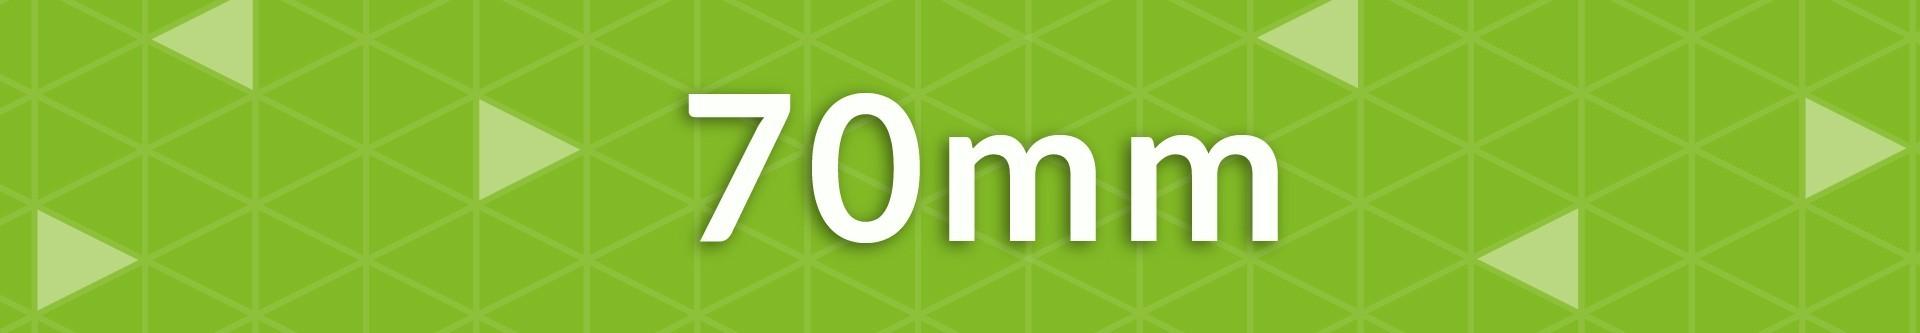 Casetas de jardín 70 mm